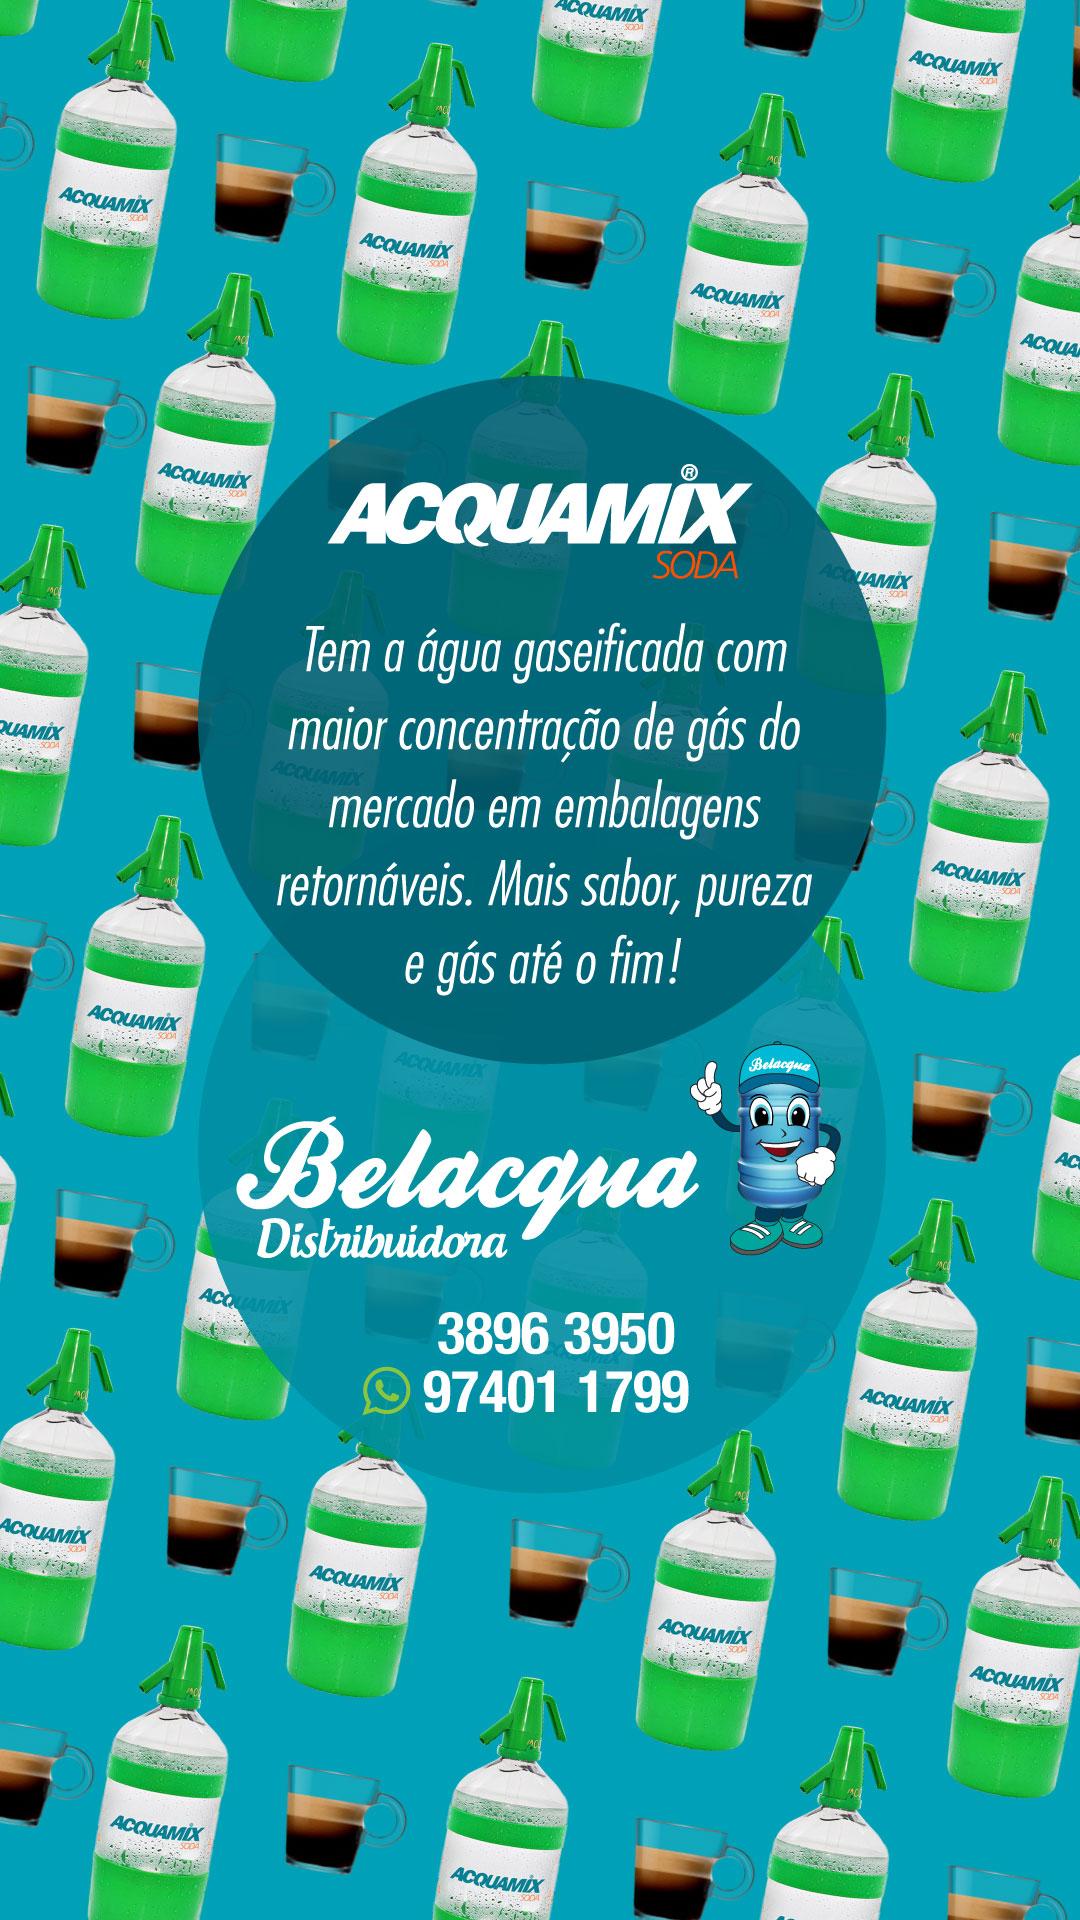 BELACQUA ACQUAMIX - ANÚNCIO